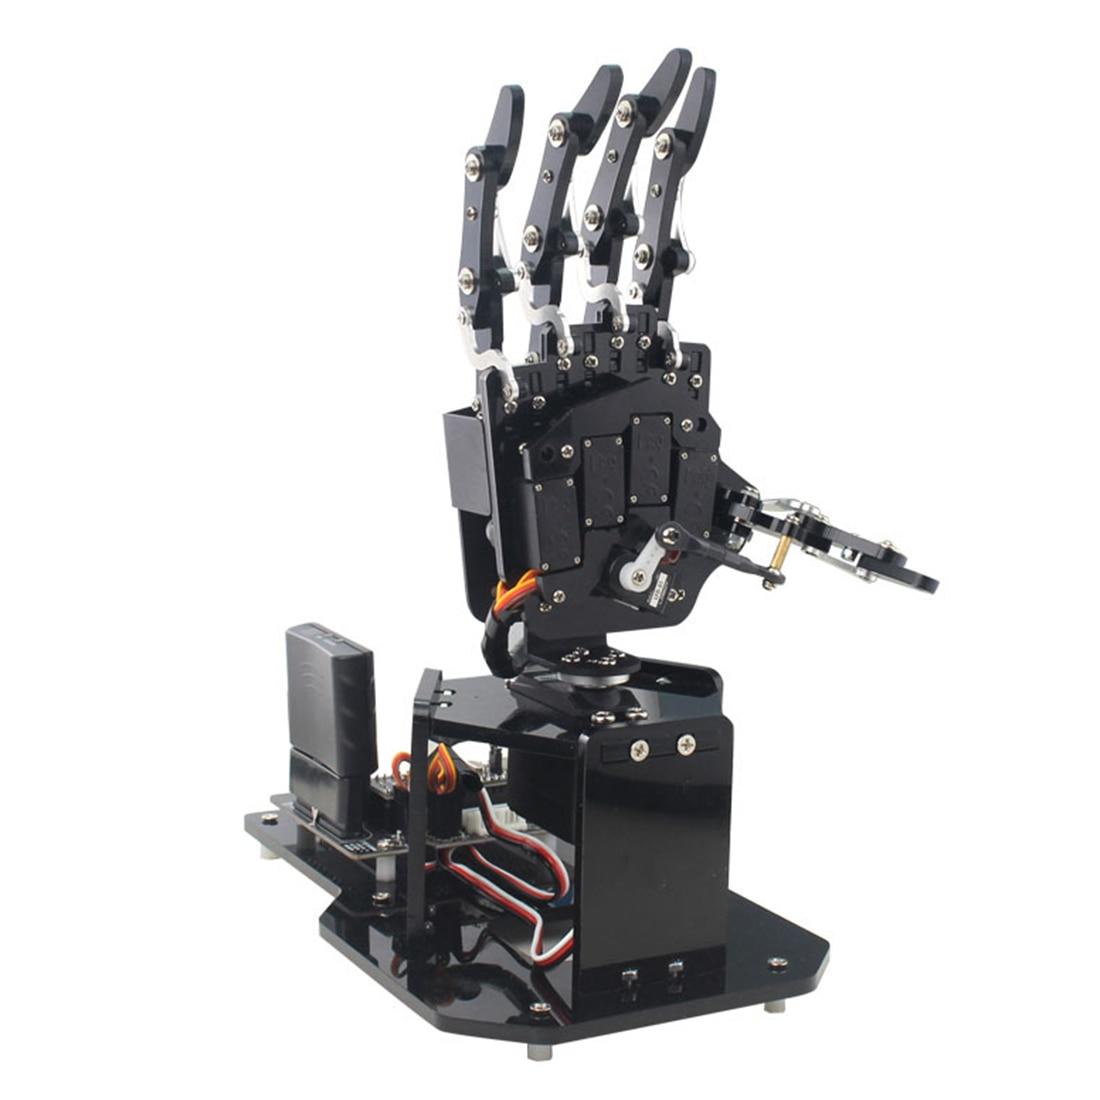 New Hot 1Pcs Open Source Robot Palm Bionic Mechanical Palm Sense Maker For Arduino